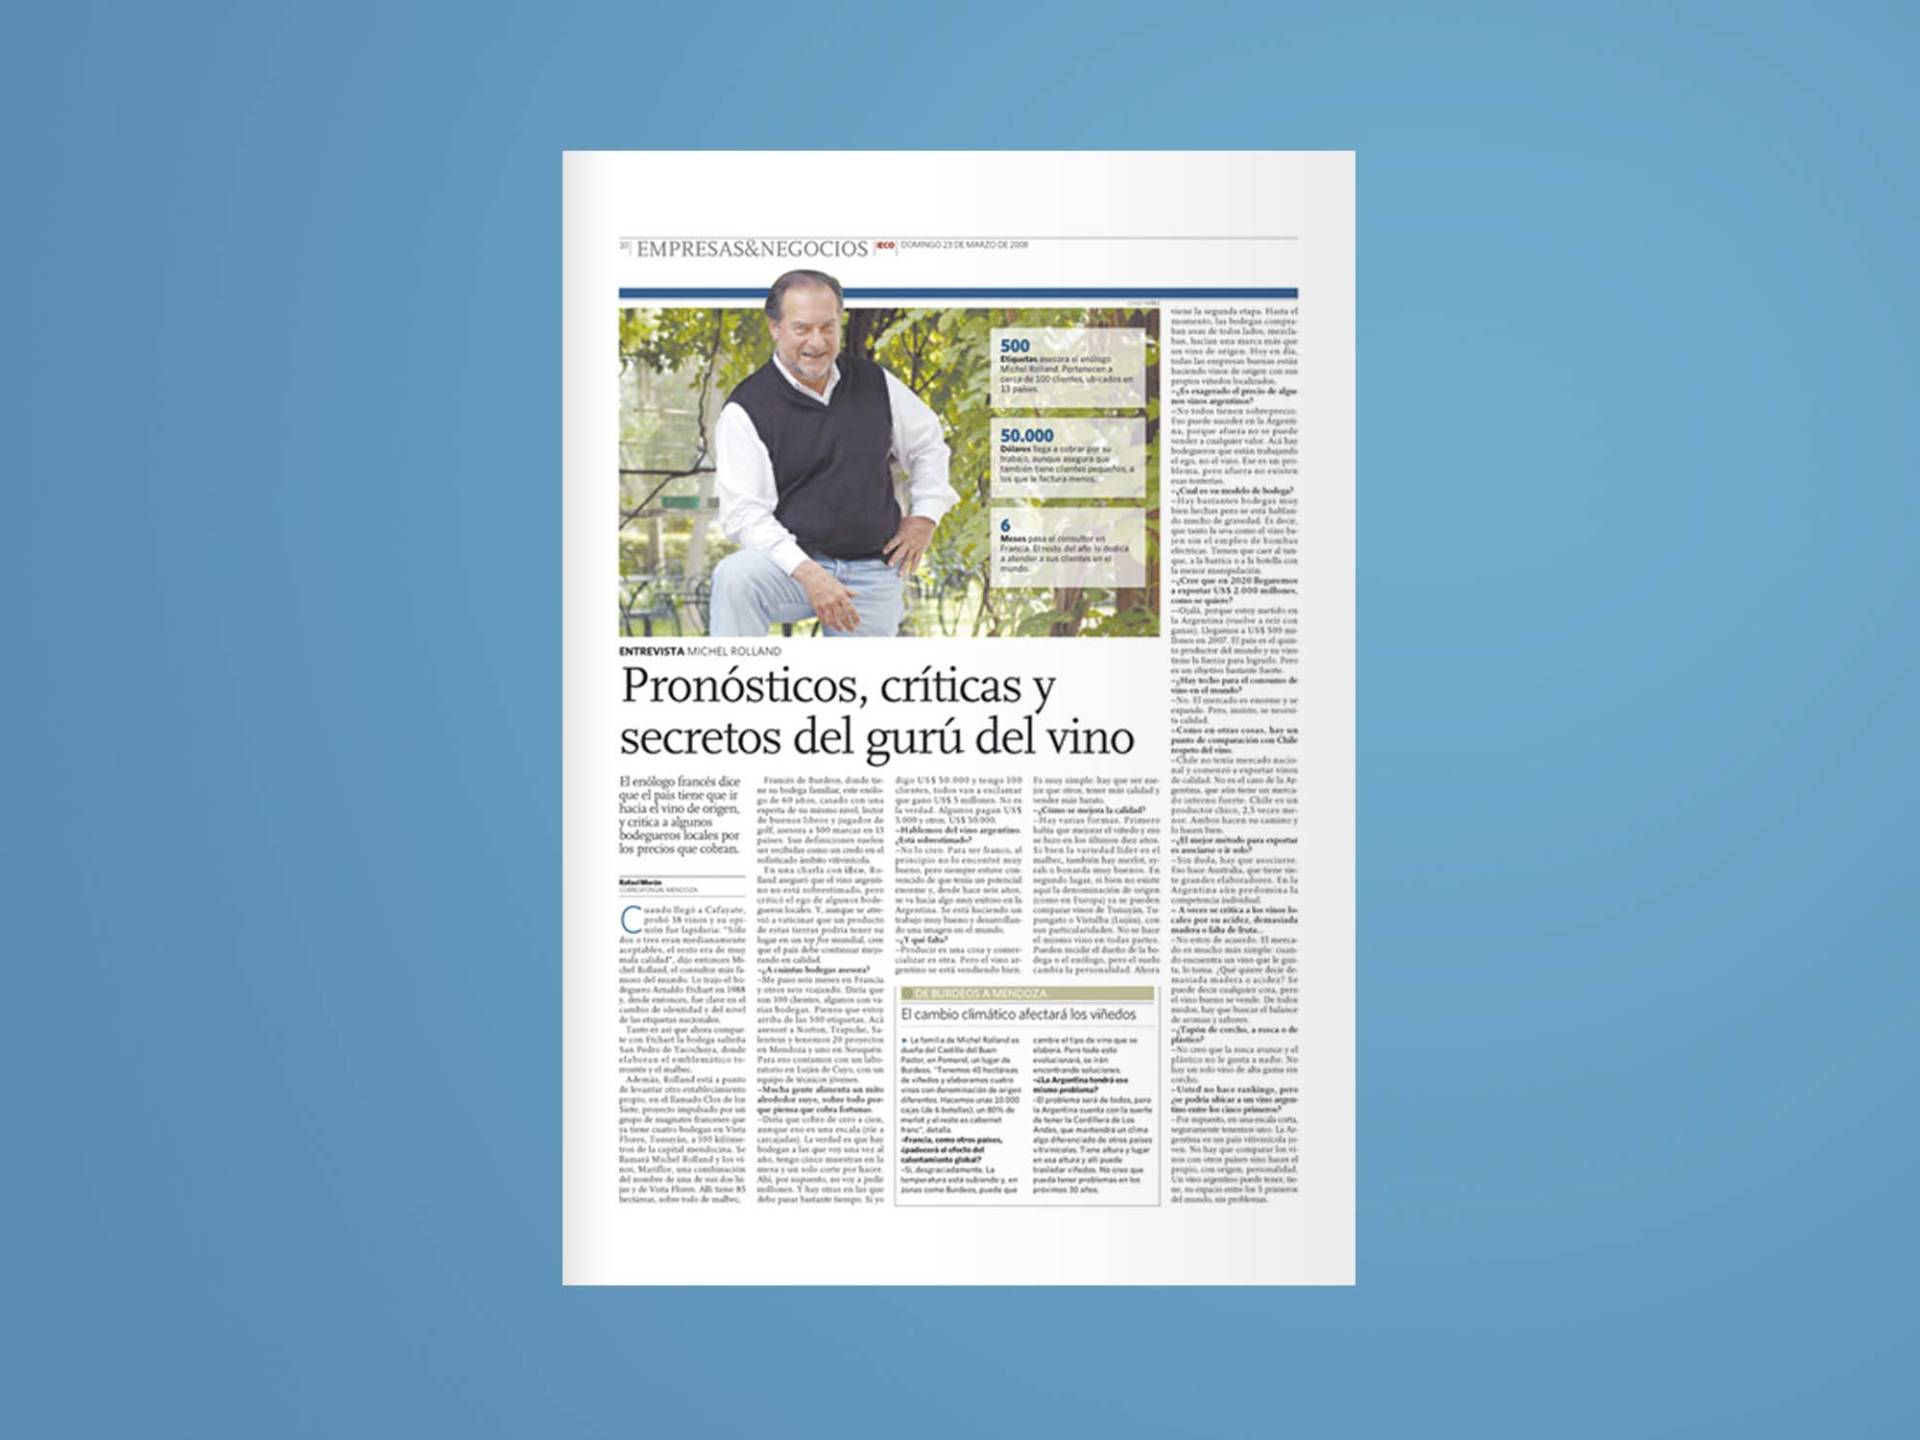 iEco_Supplementi_04_Wenceslau_News_Design